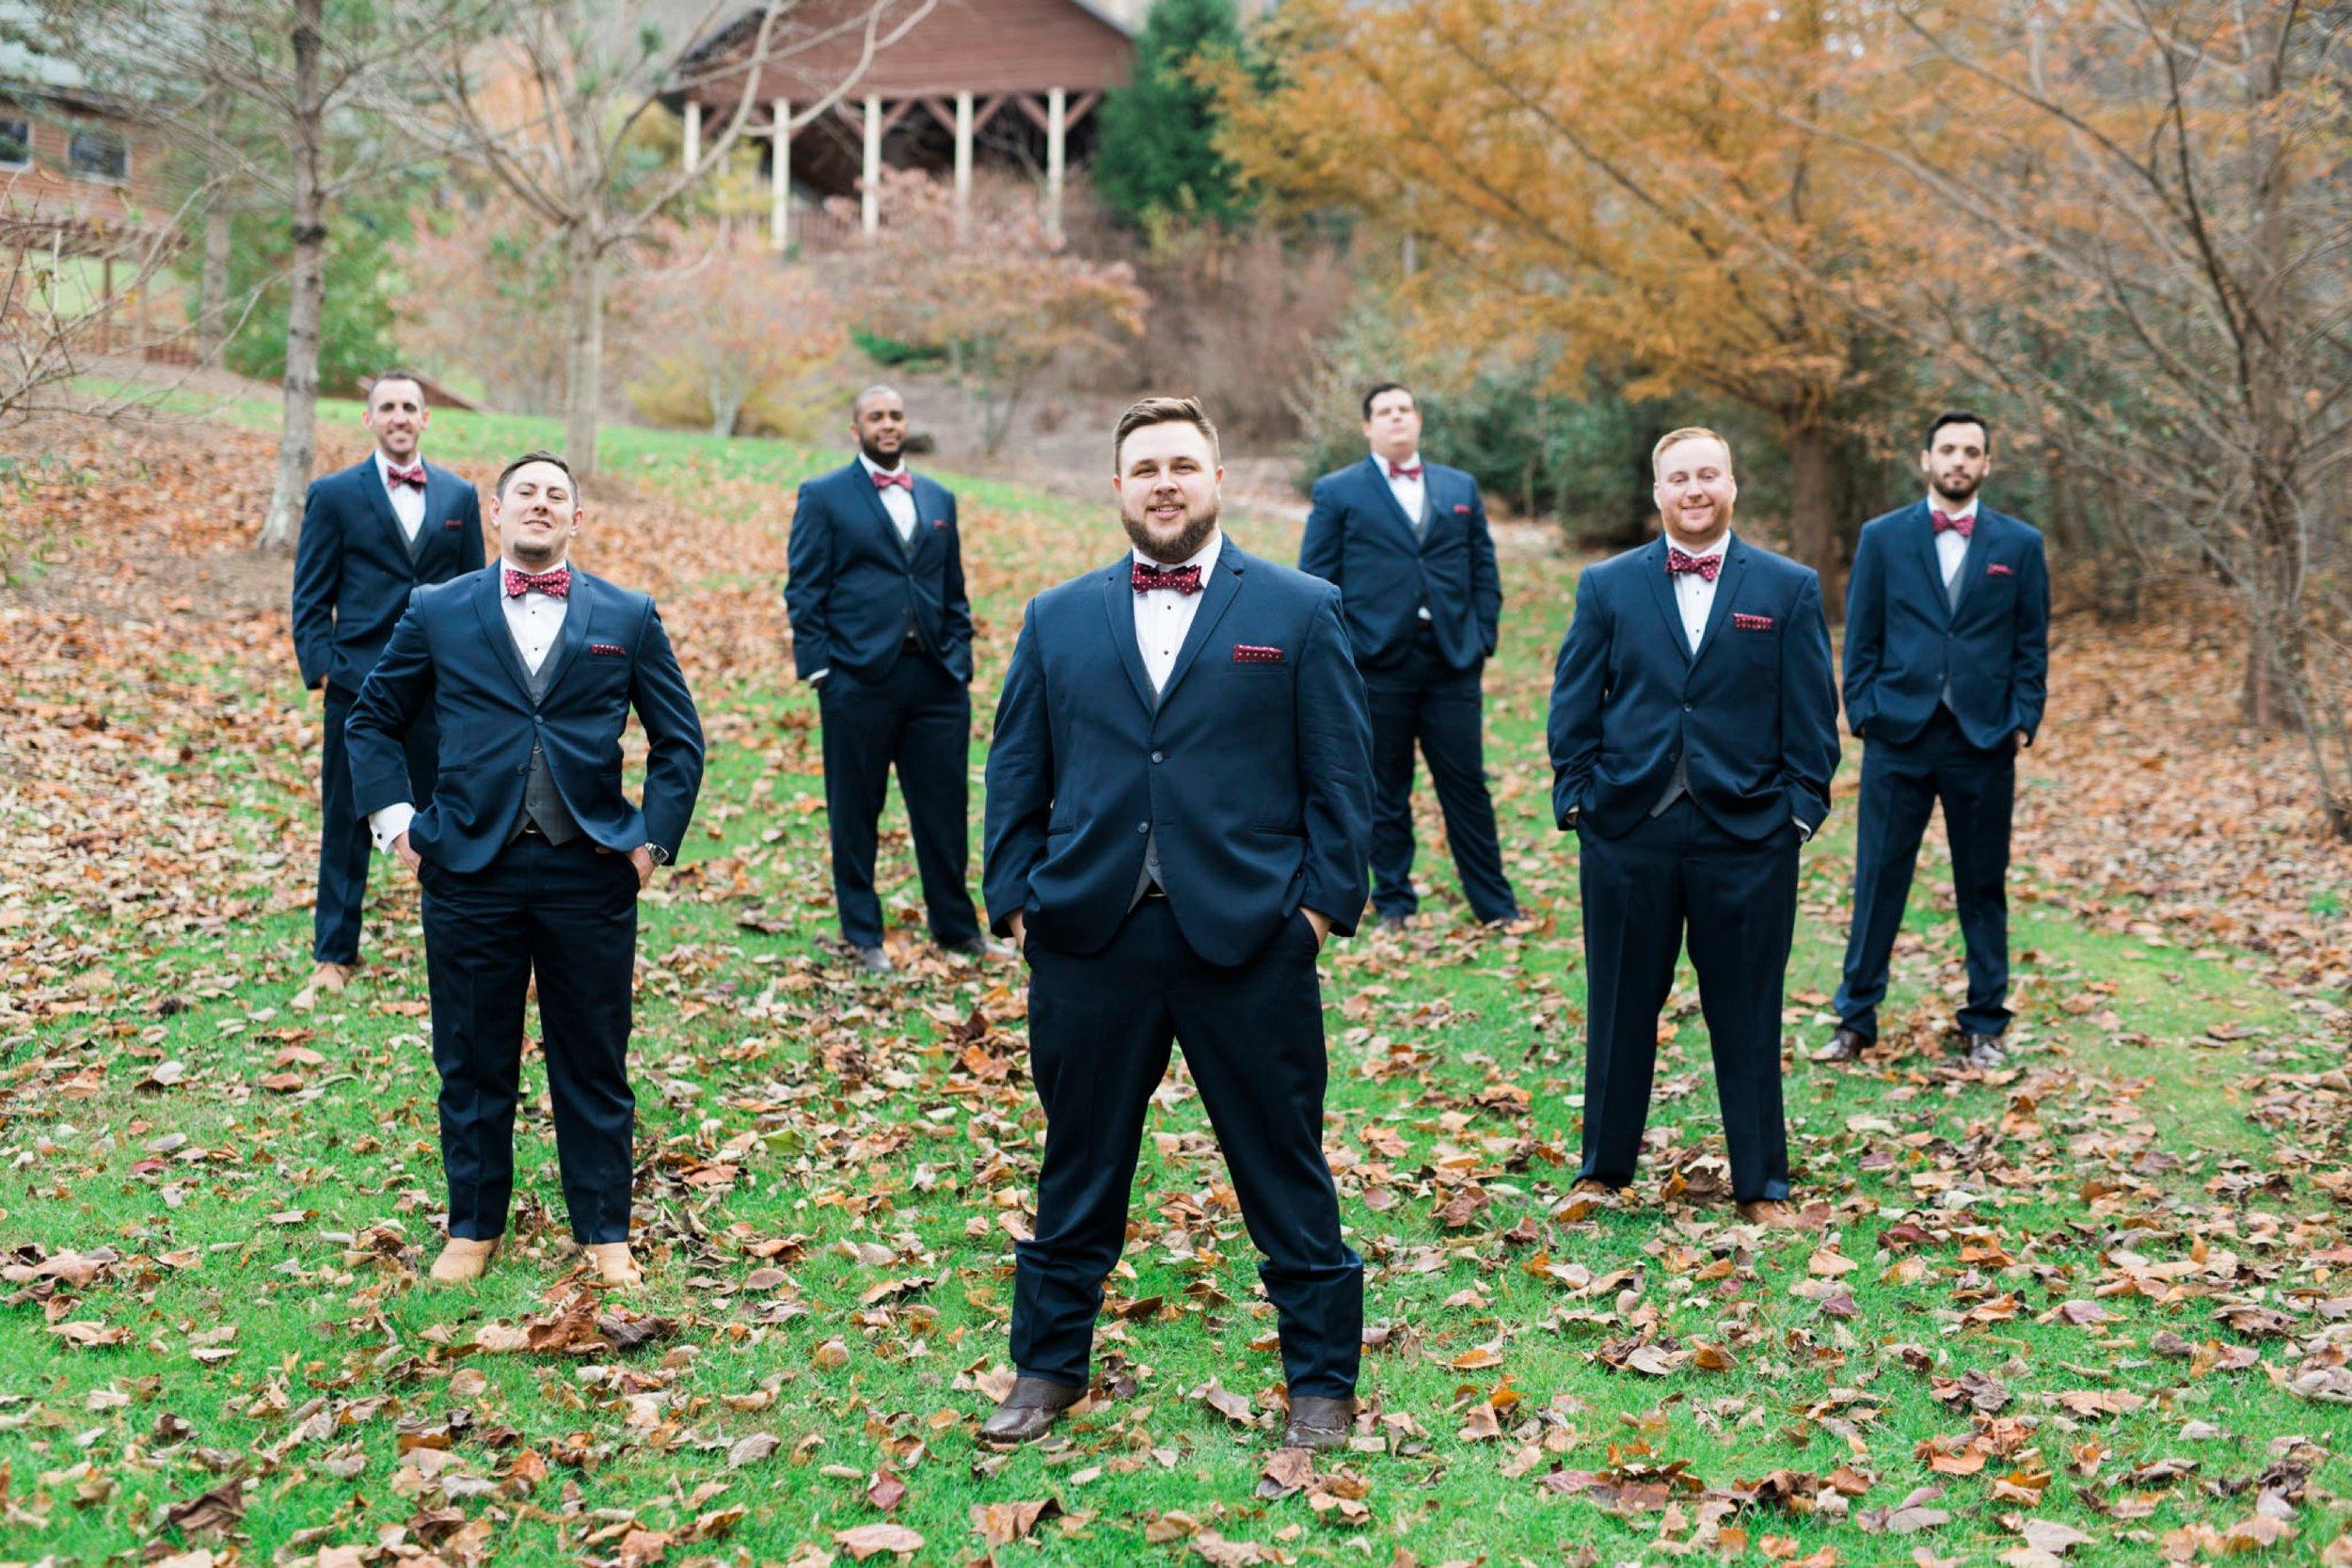 IrvineEstate_LexingtonVA_Wedding_FallWedding_VirginiaWeddingPhotographer 28.jpg